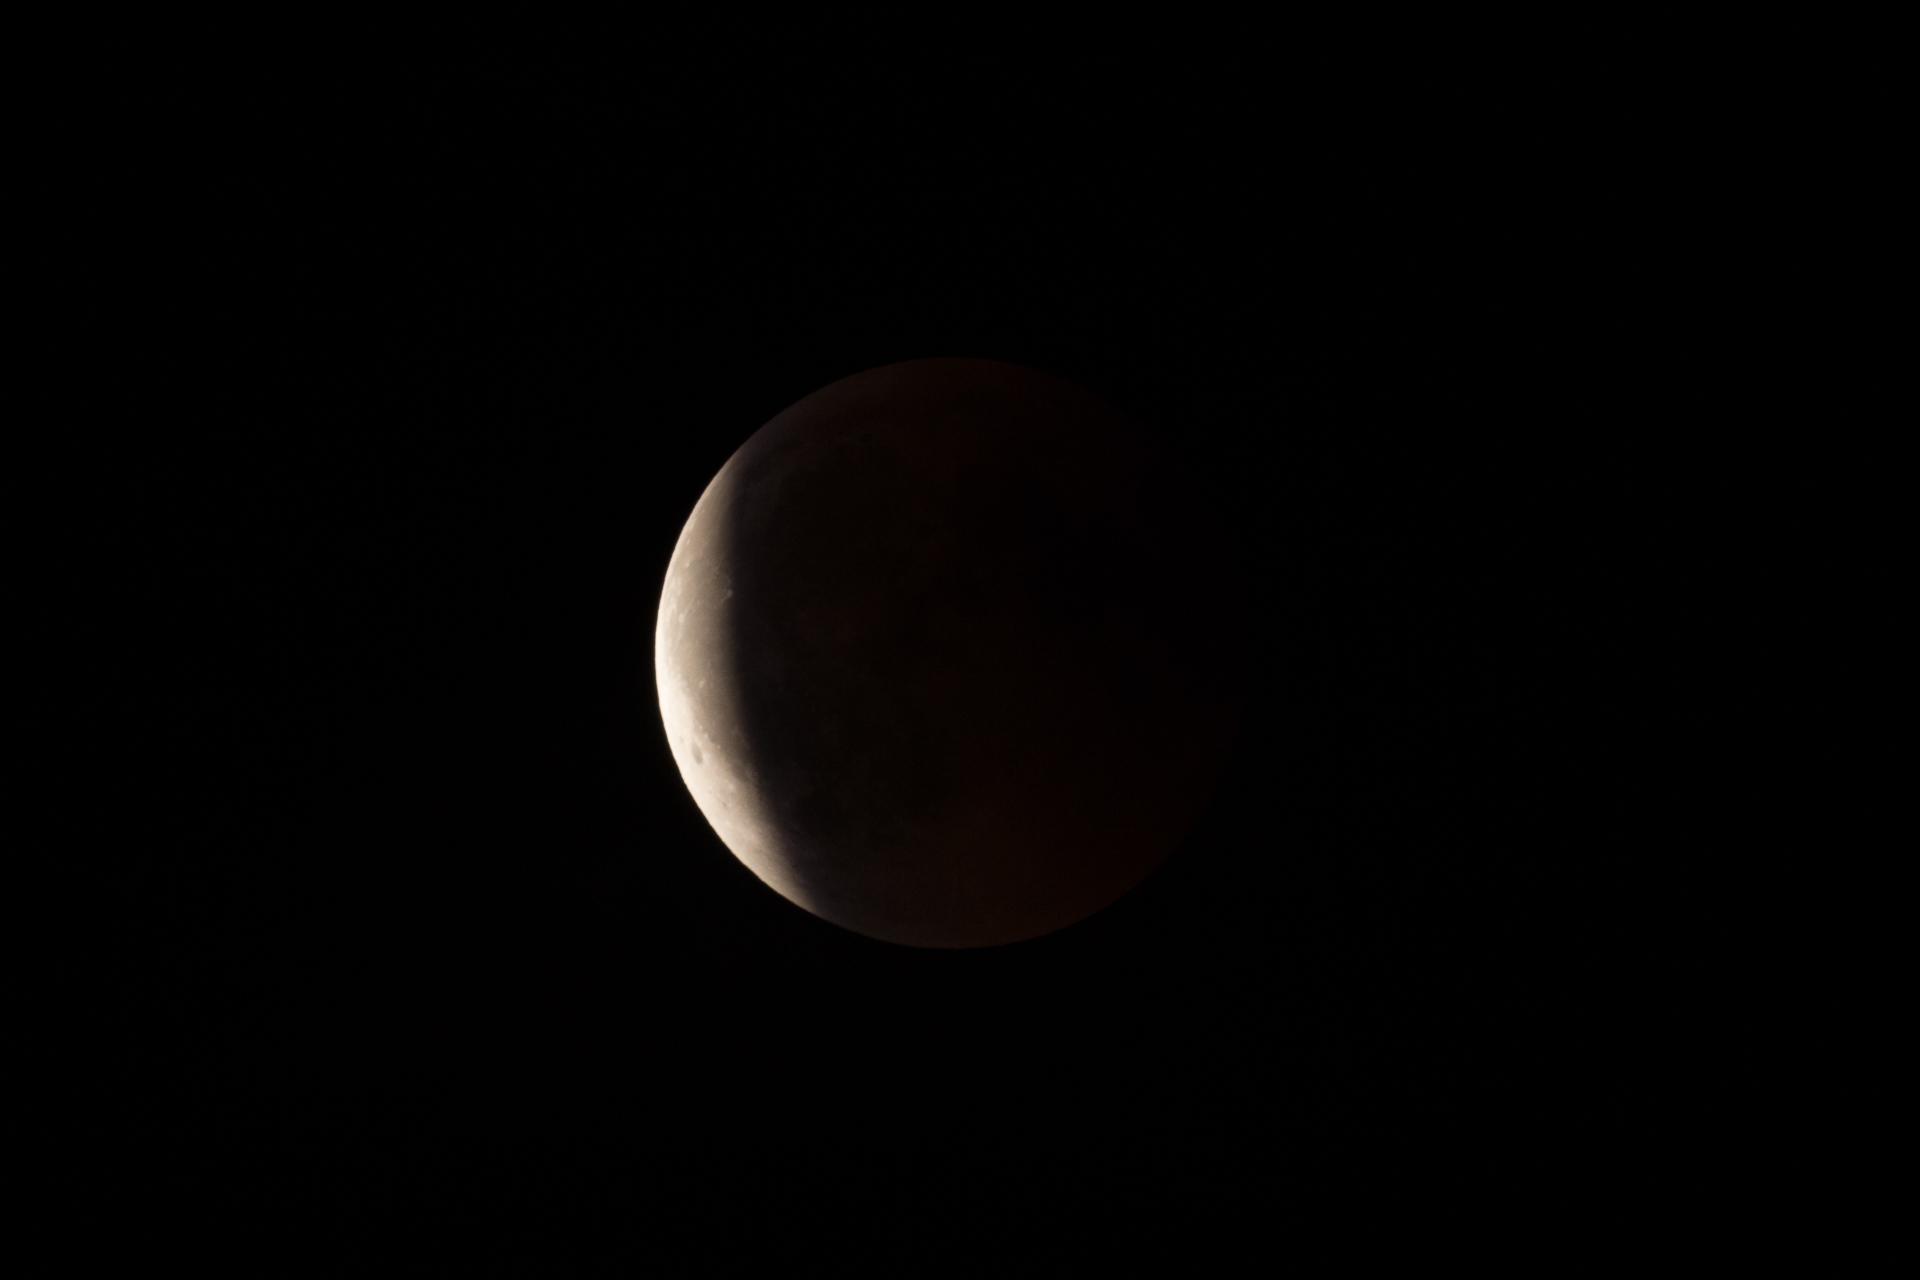 20180727_LunarEclipse-7